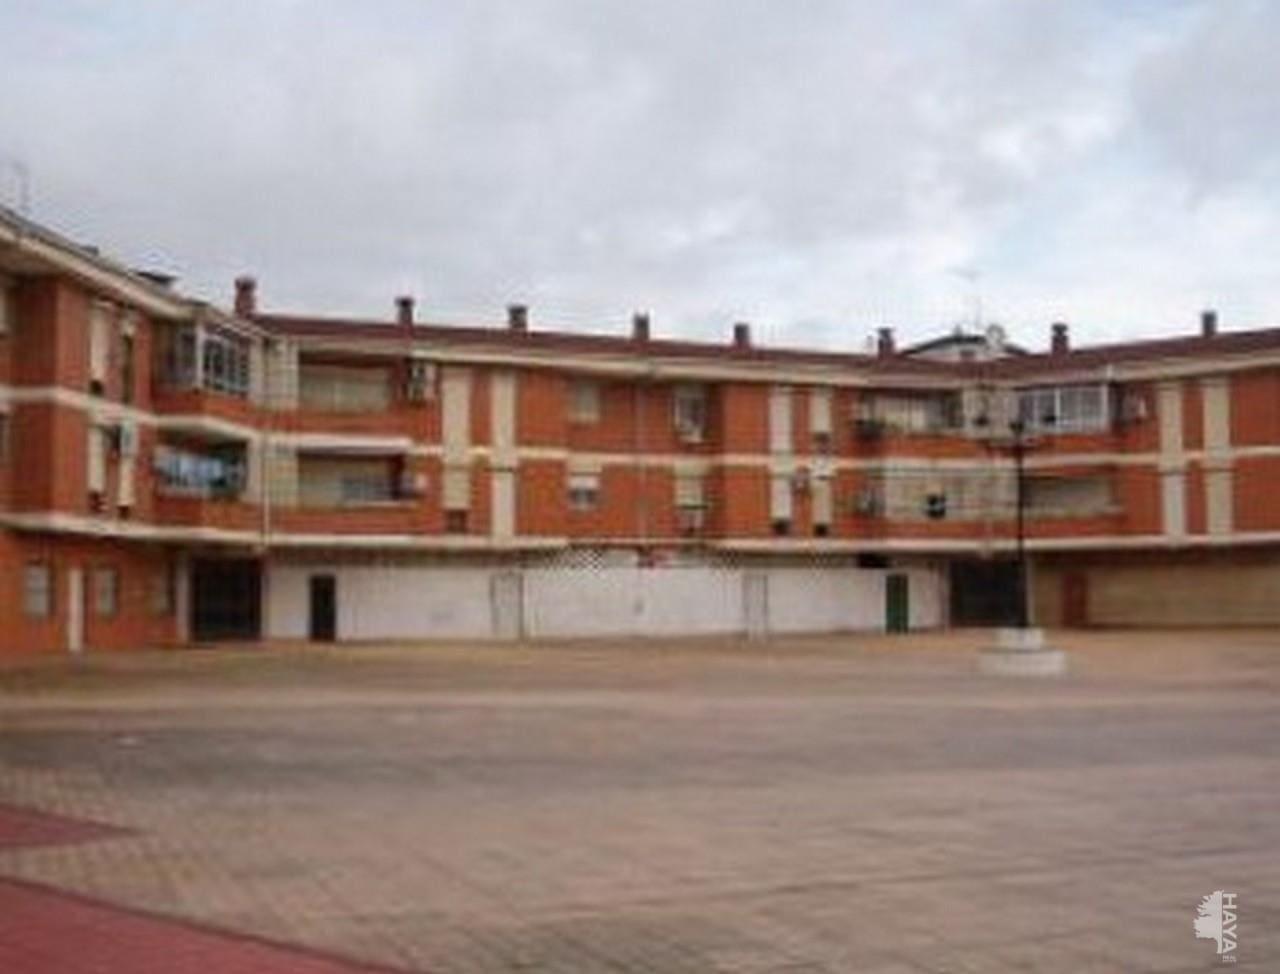 Local en venta en Cáceres, Cáceres, Plaza Roque Balduque, 45.000 €, 146 m2